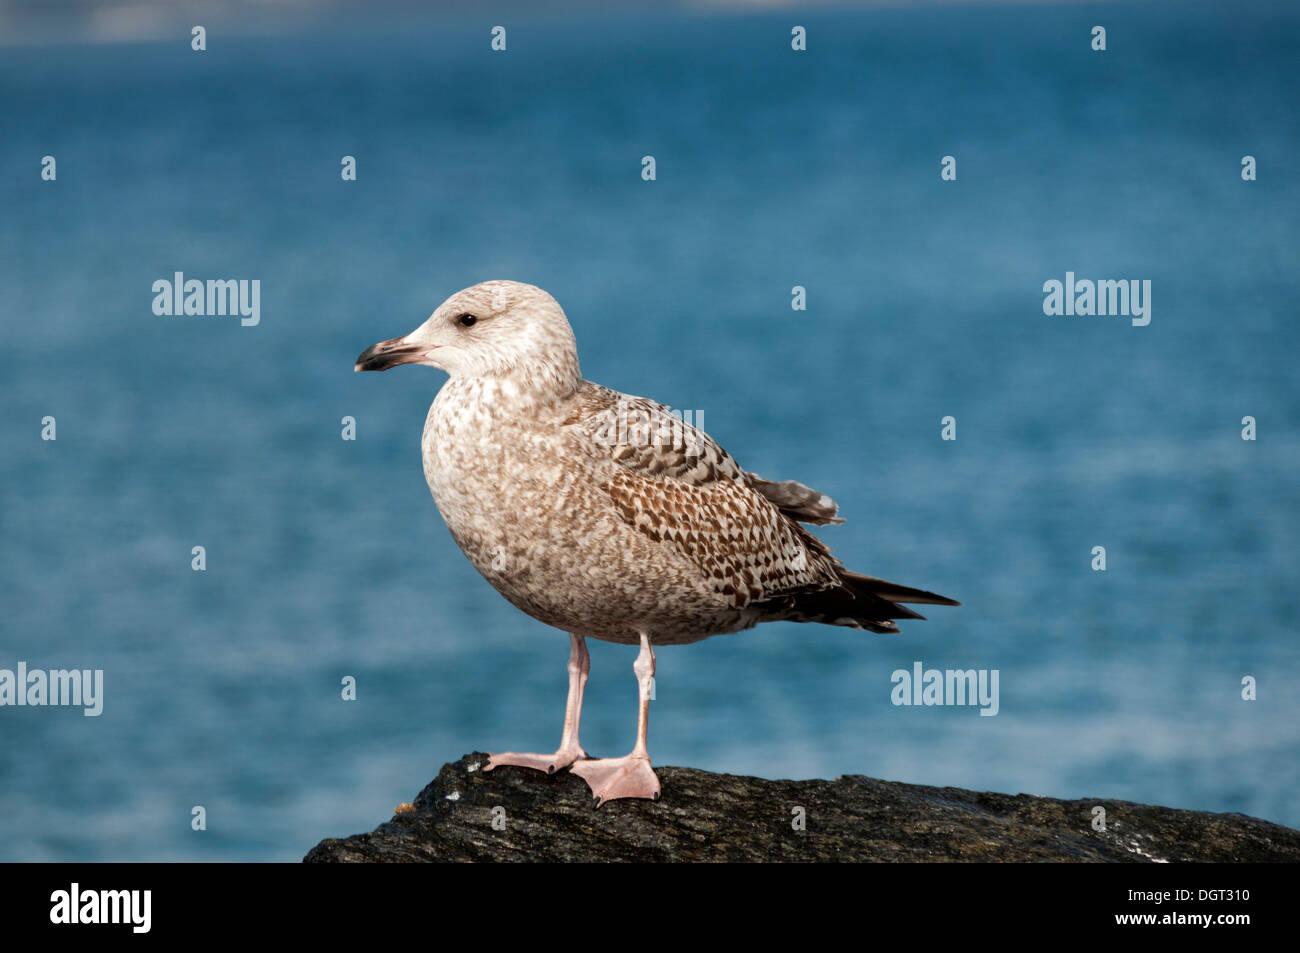 Immature (1st winter) Herring Gull (Larus argentatus), at Mallaig, Highland region, Scotland, UK. - Stock Image